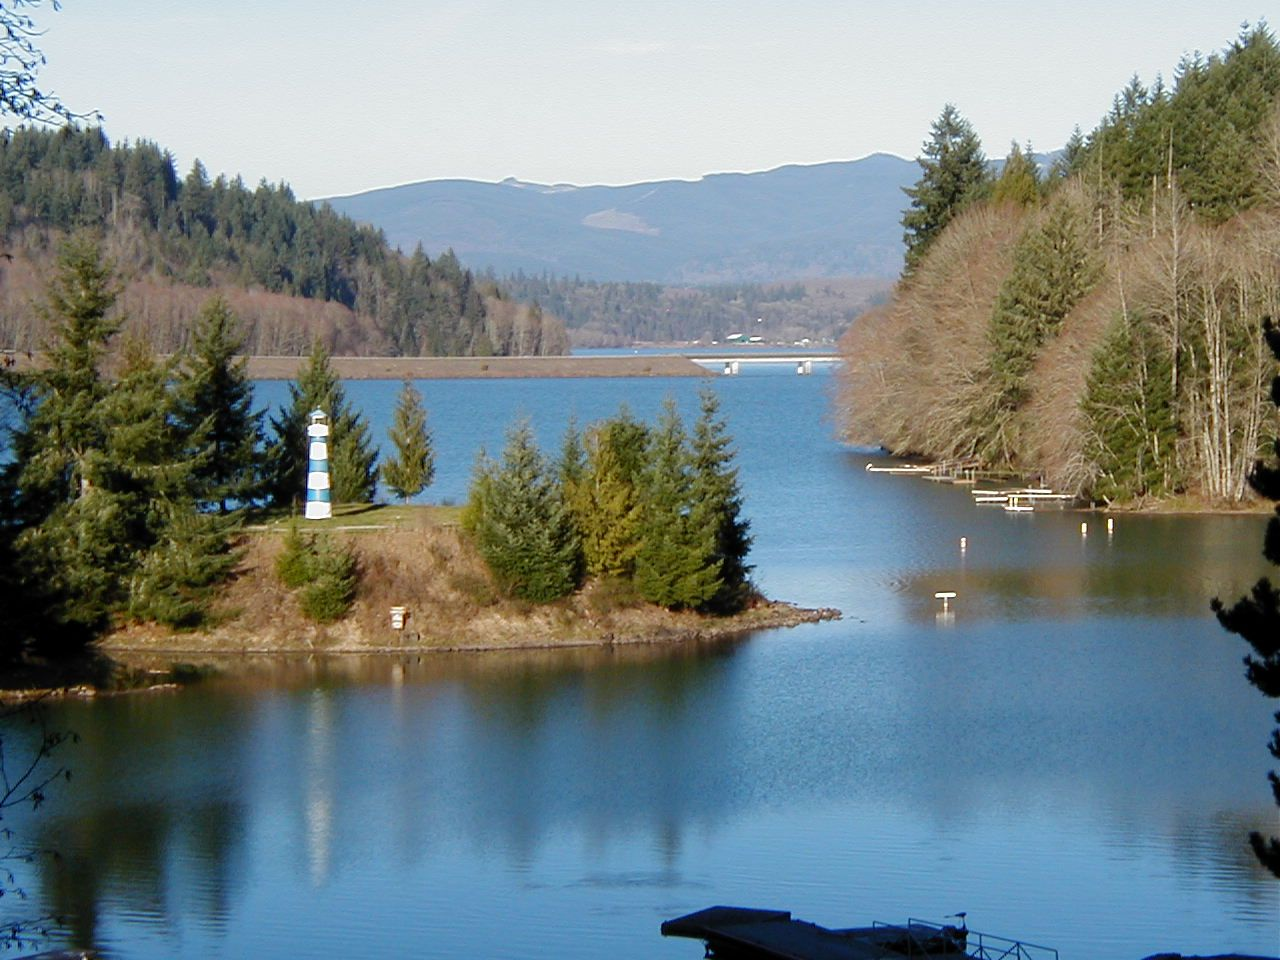 Lake Mayfield Resort and Marina between Portland